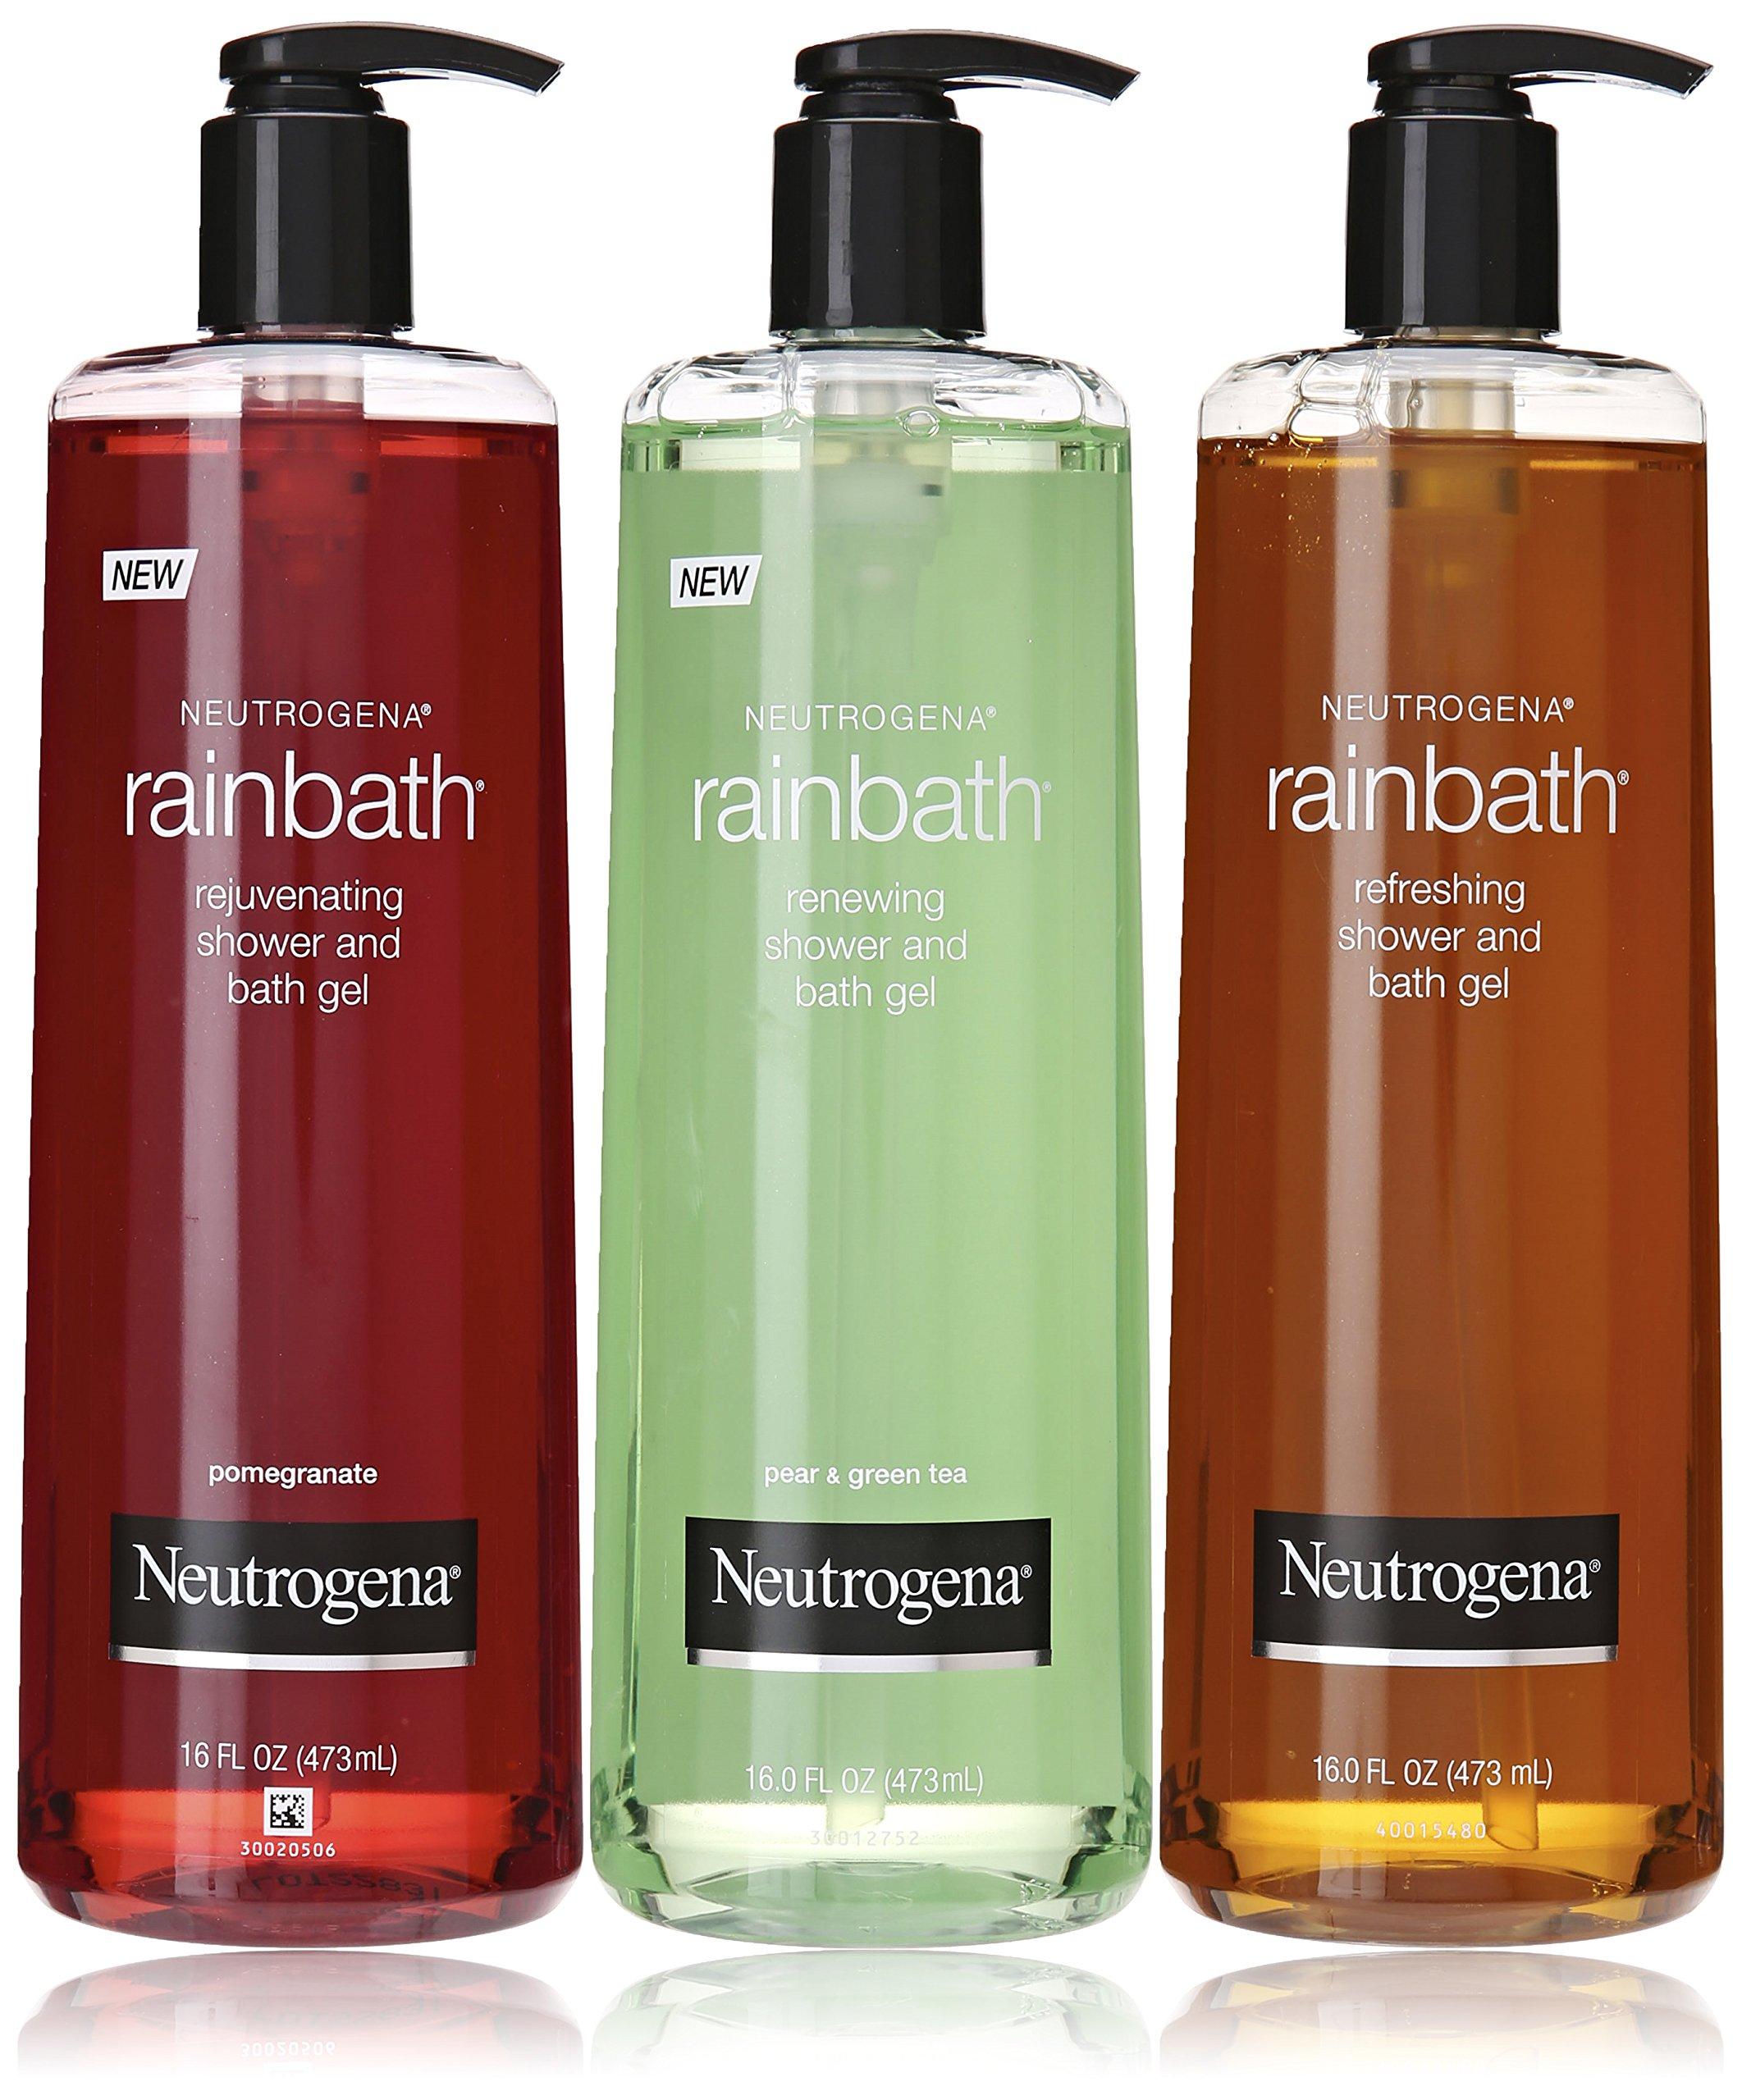 Neutrogena Rainbath Multi-pack of 3, 1 Original Formula, 1 Pomegranate and 1 Pear & Green Tea, 16 fl oz bottles